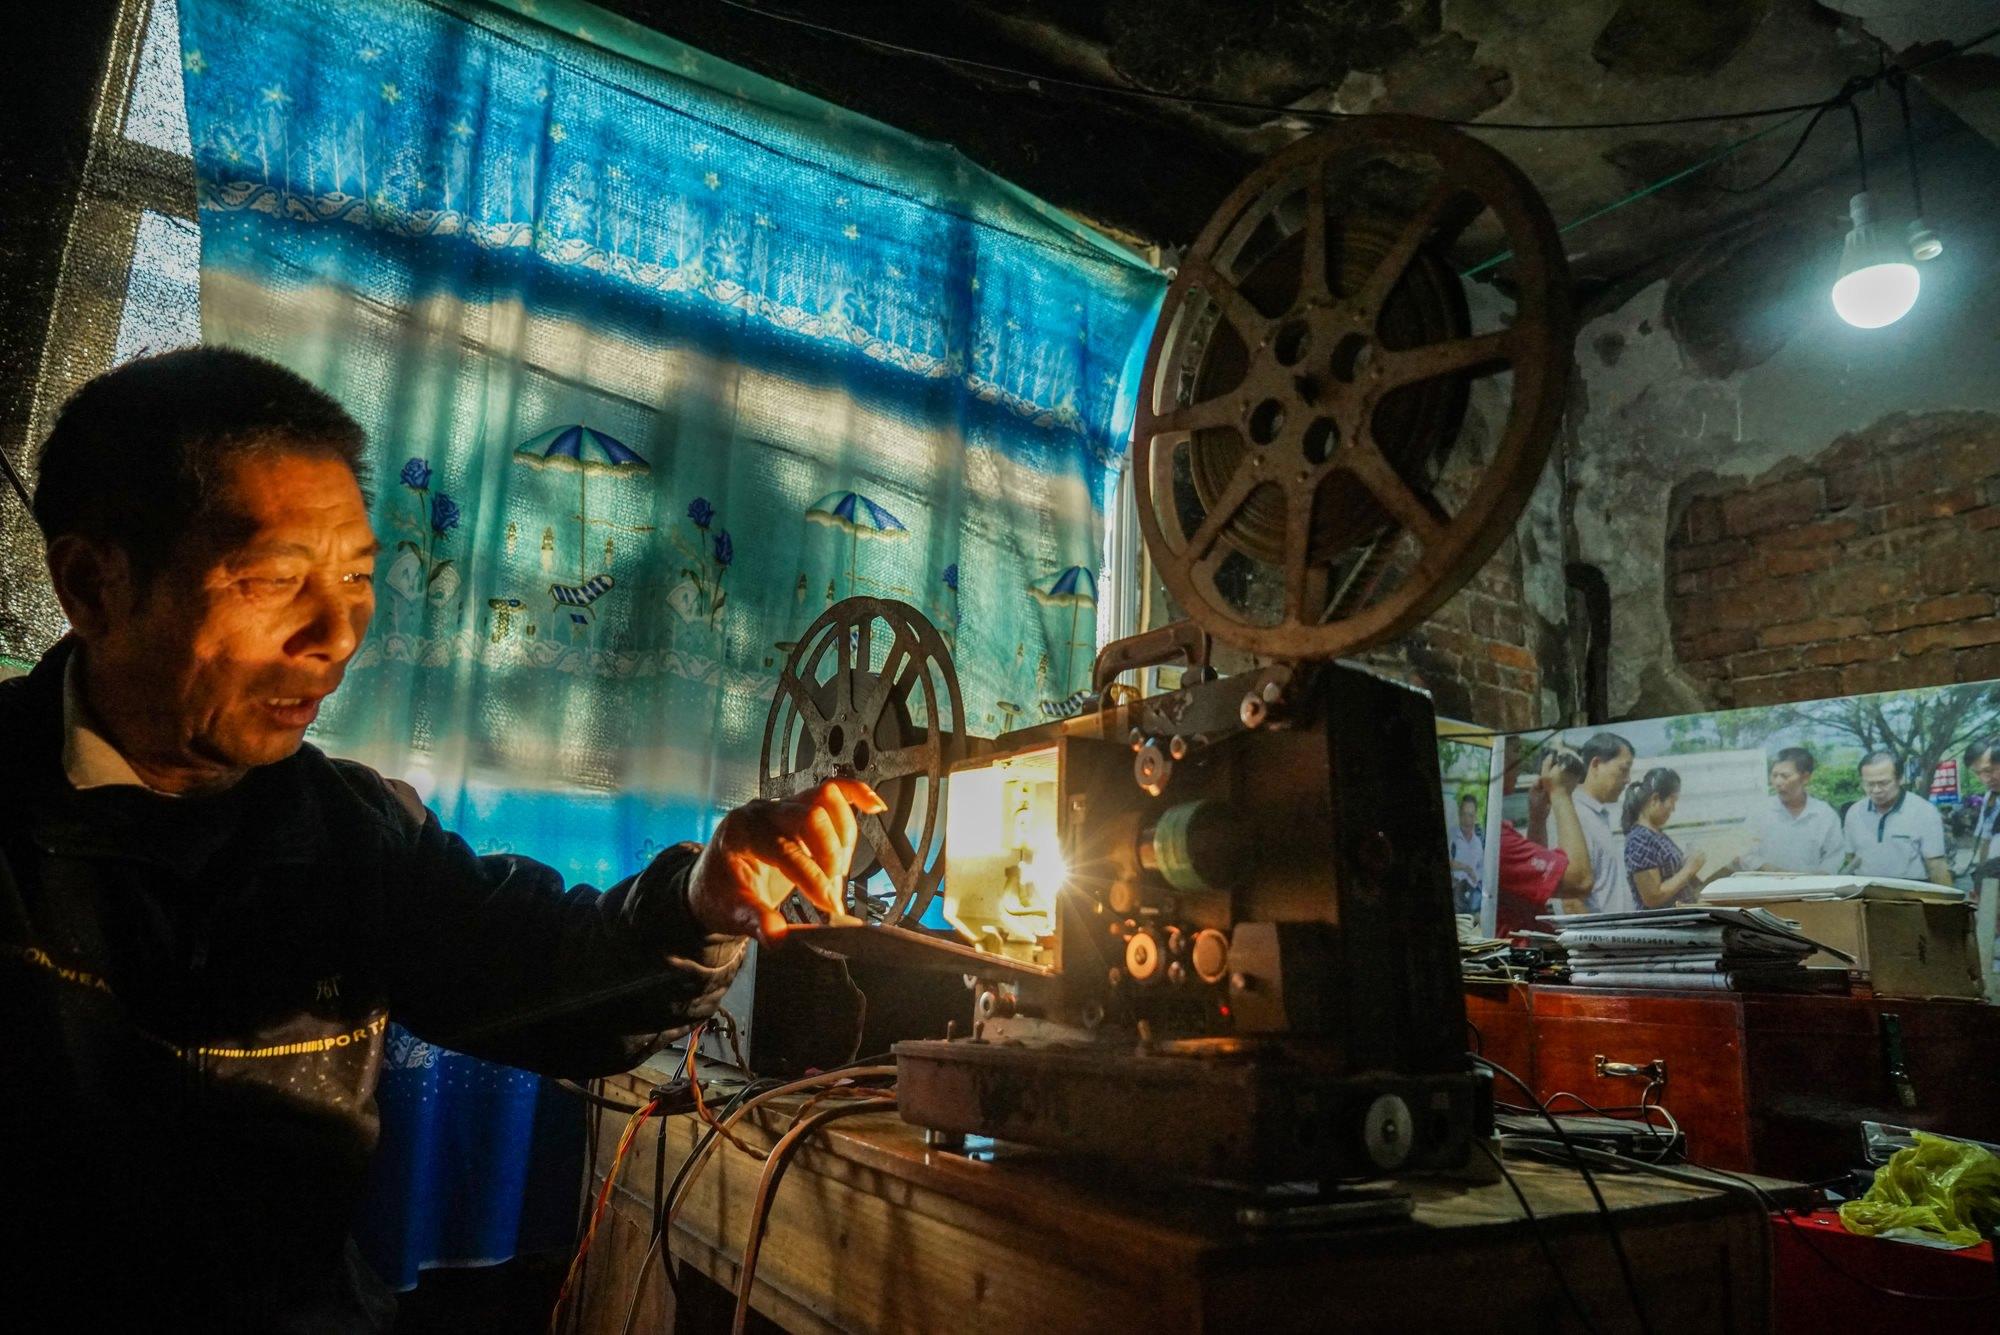 qinzhou chatrooms Westkapelle buddhist dating site elberton chat rooms buddhist single men in   tornio single asian girls tupper lake lesbian dating site qinzhou single.